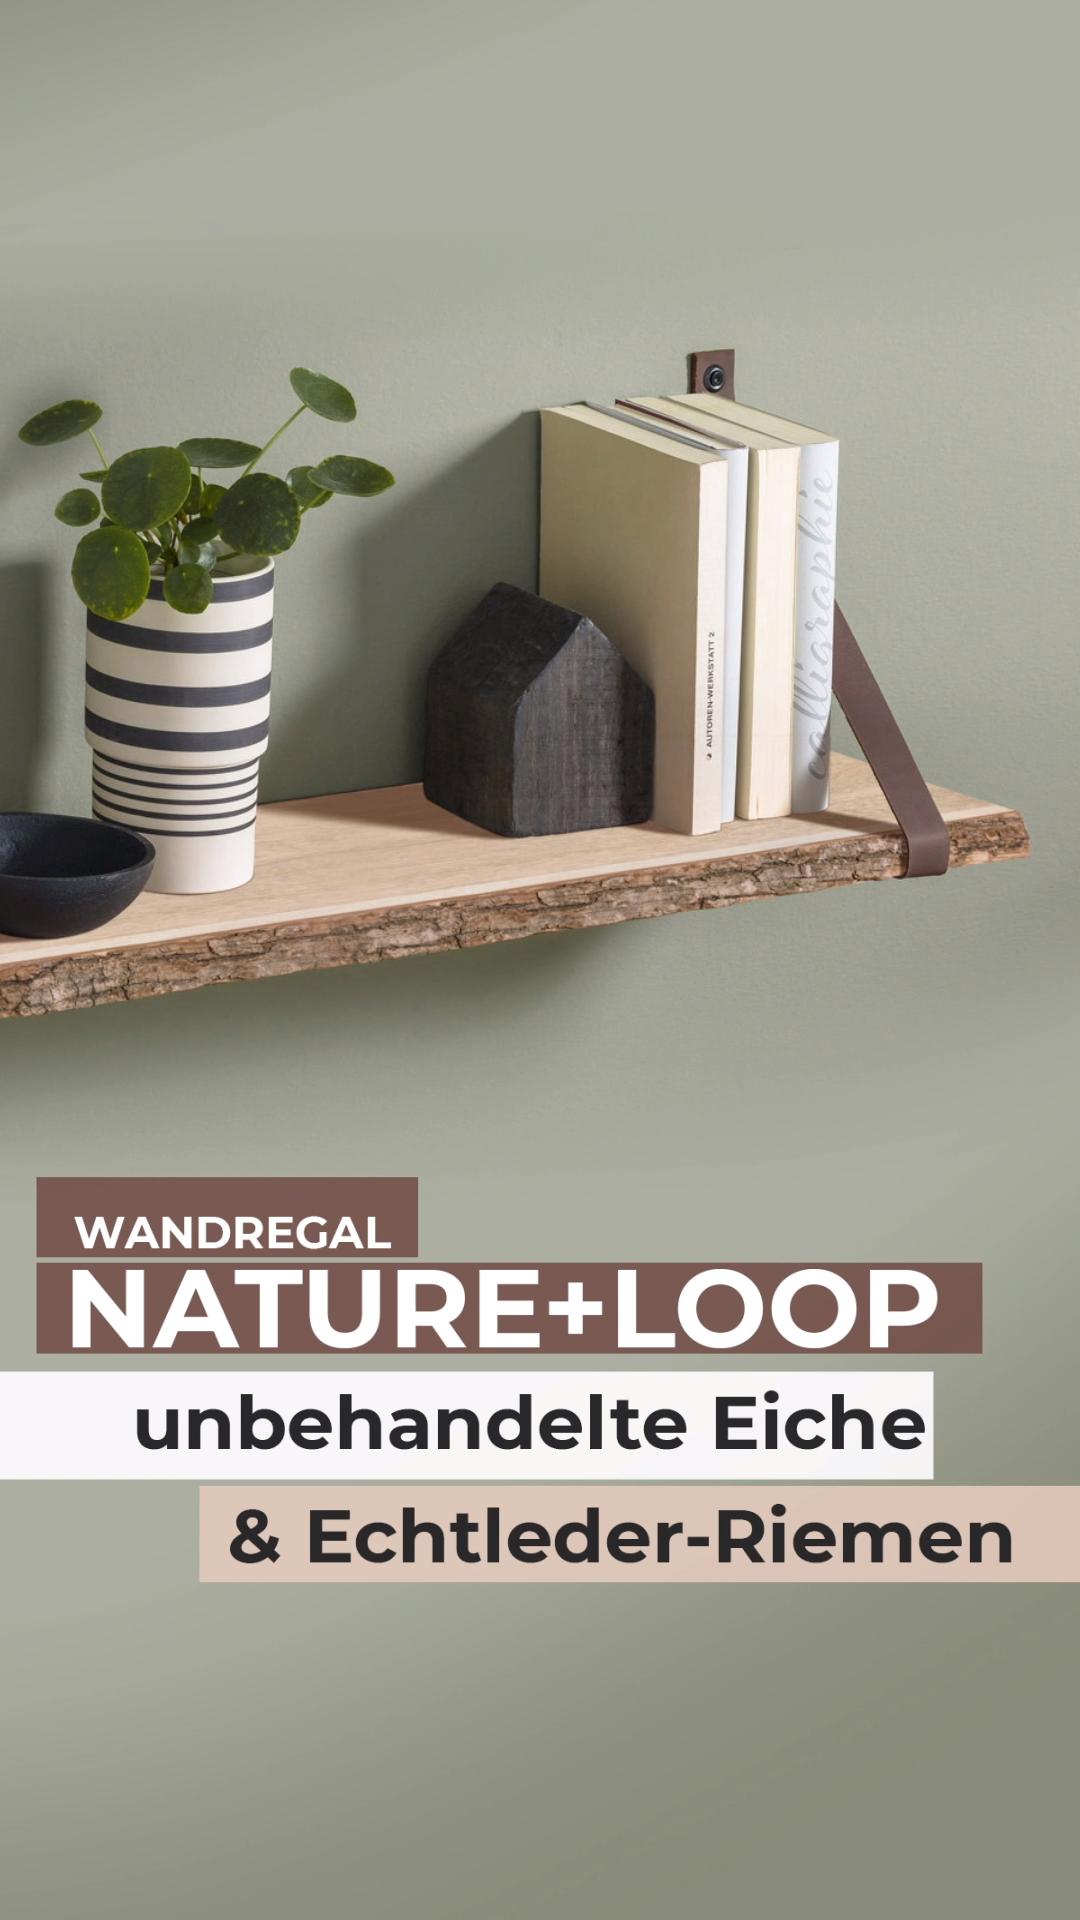 Nature Loop Regal Lederriemen 60x20 Cm Video In 2020 Regal